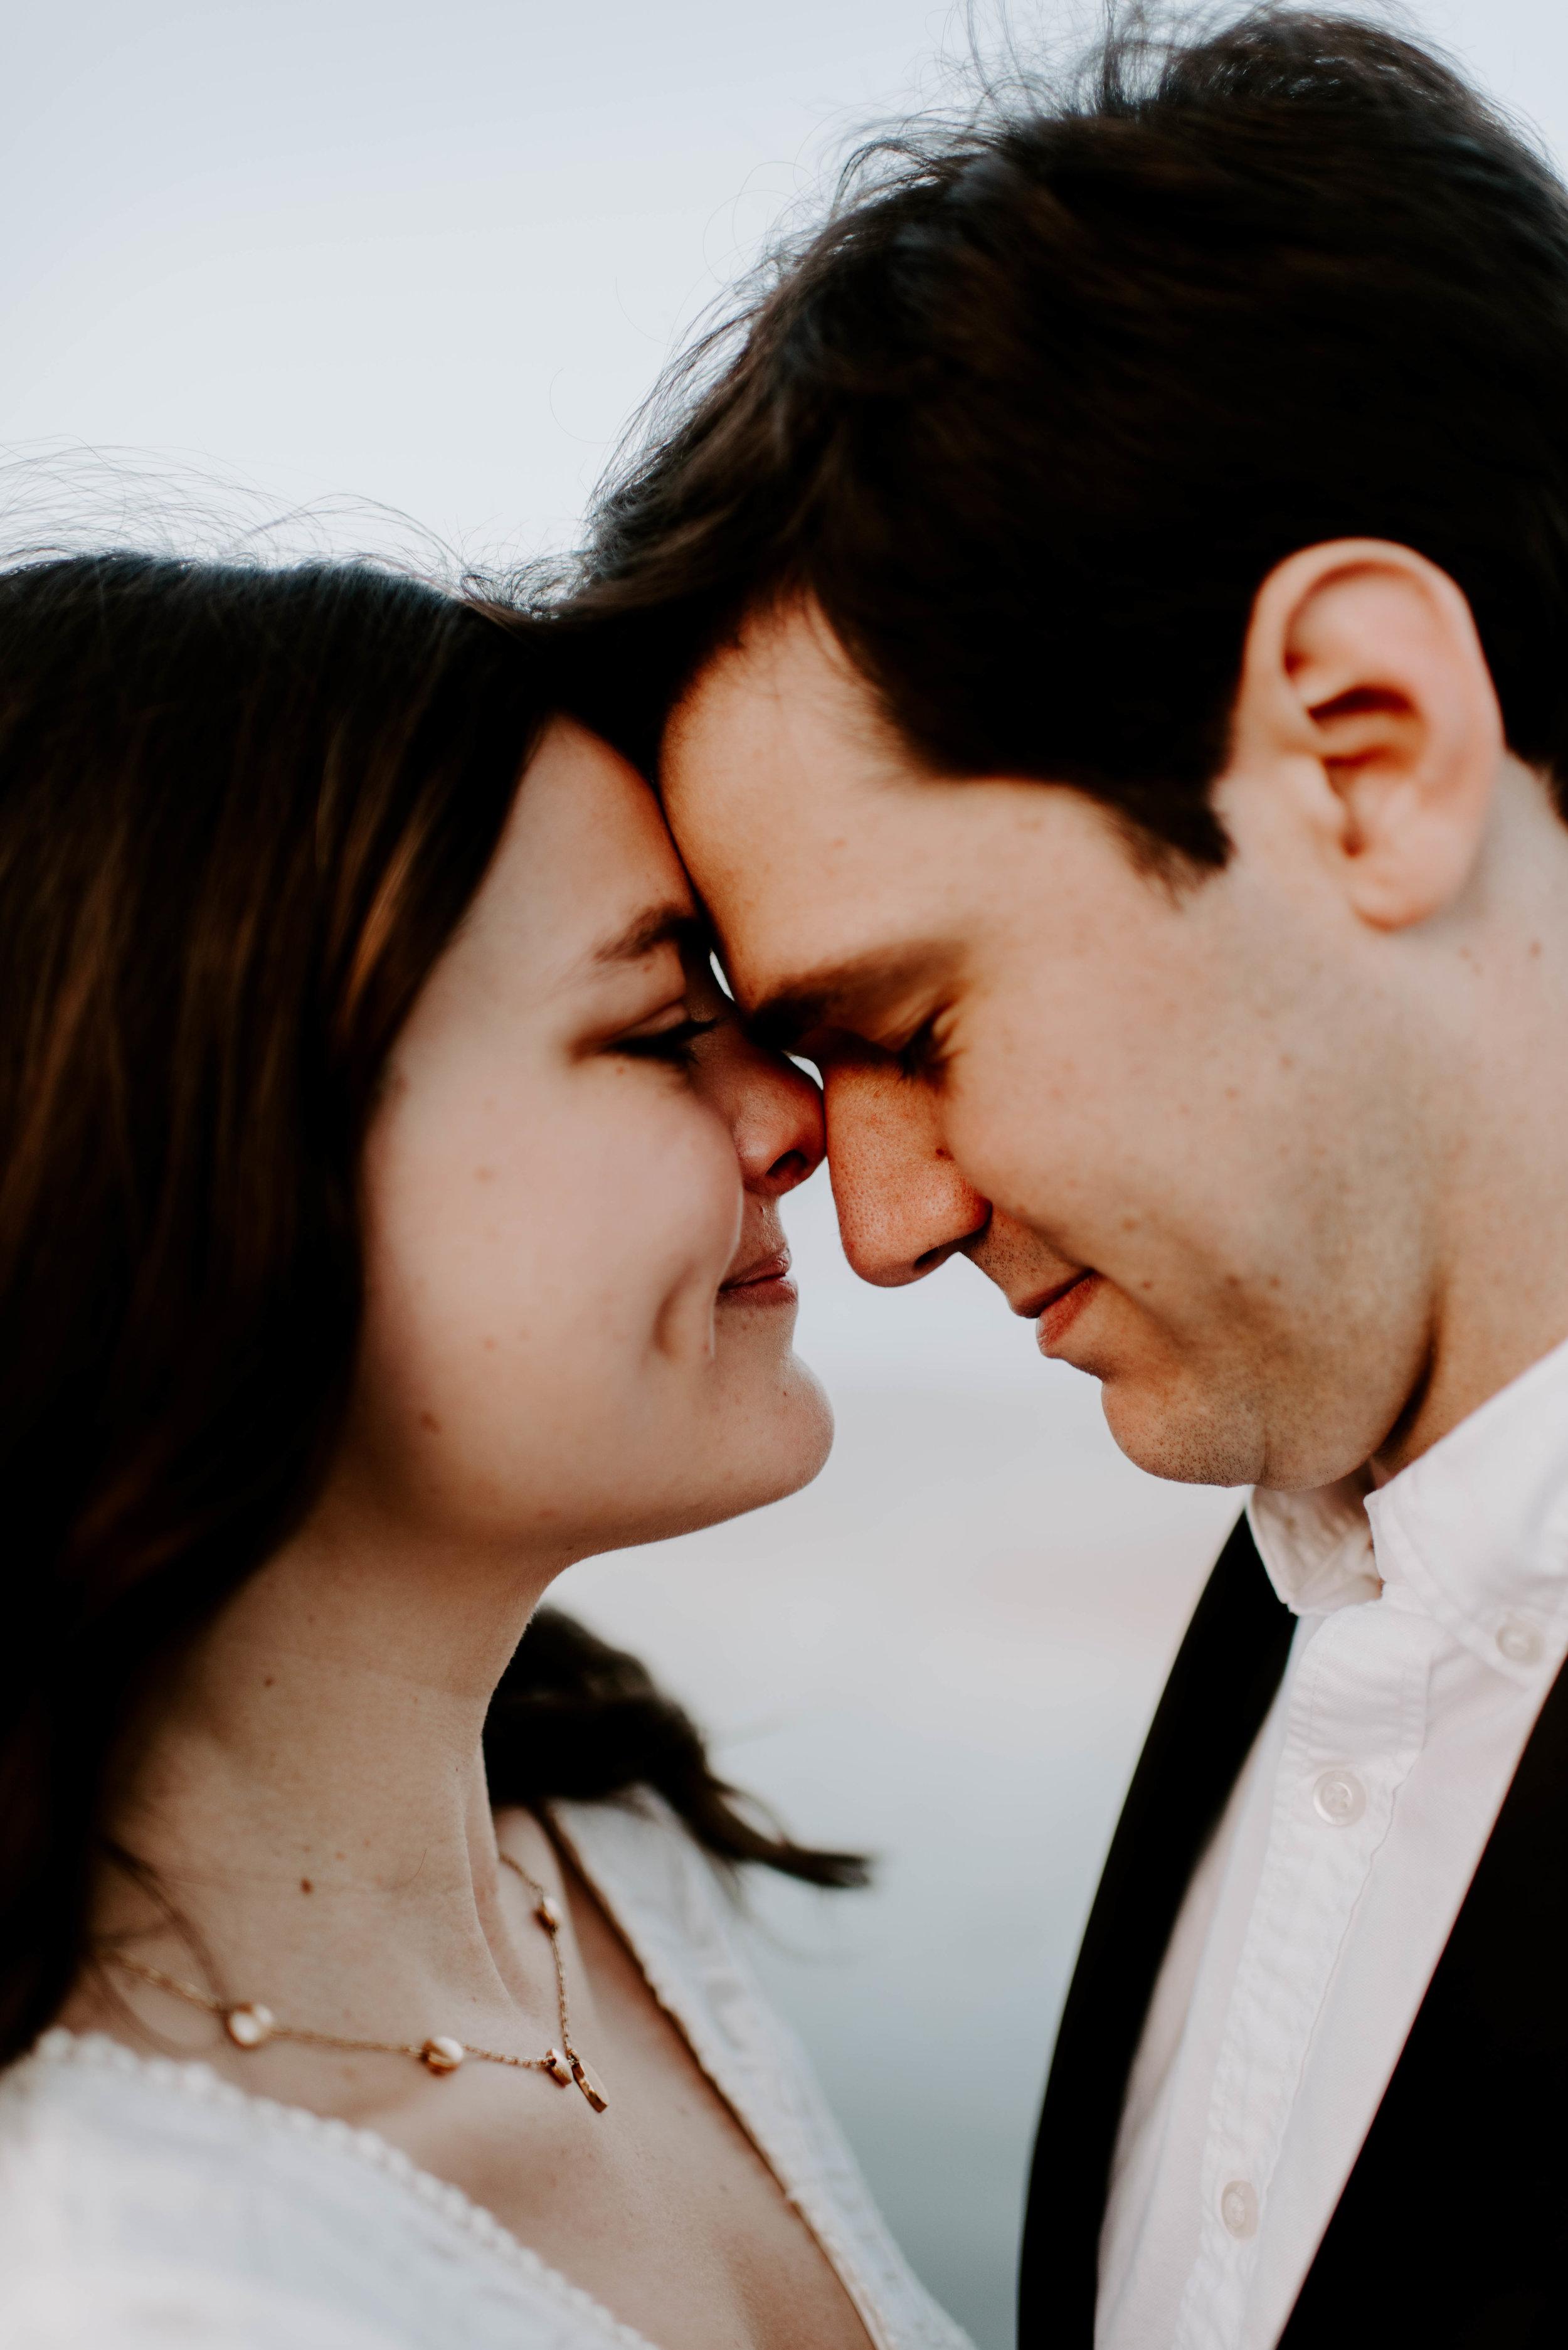 maryandnick_couplessession_cdupont-63.jpg